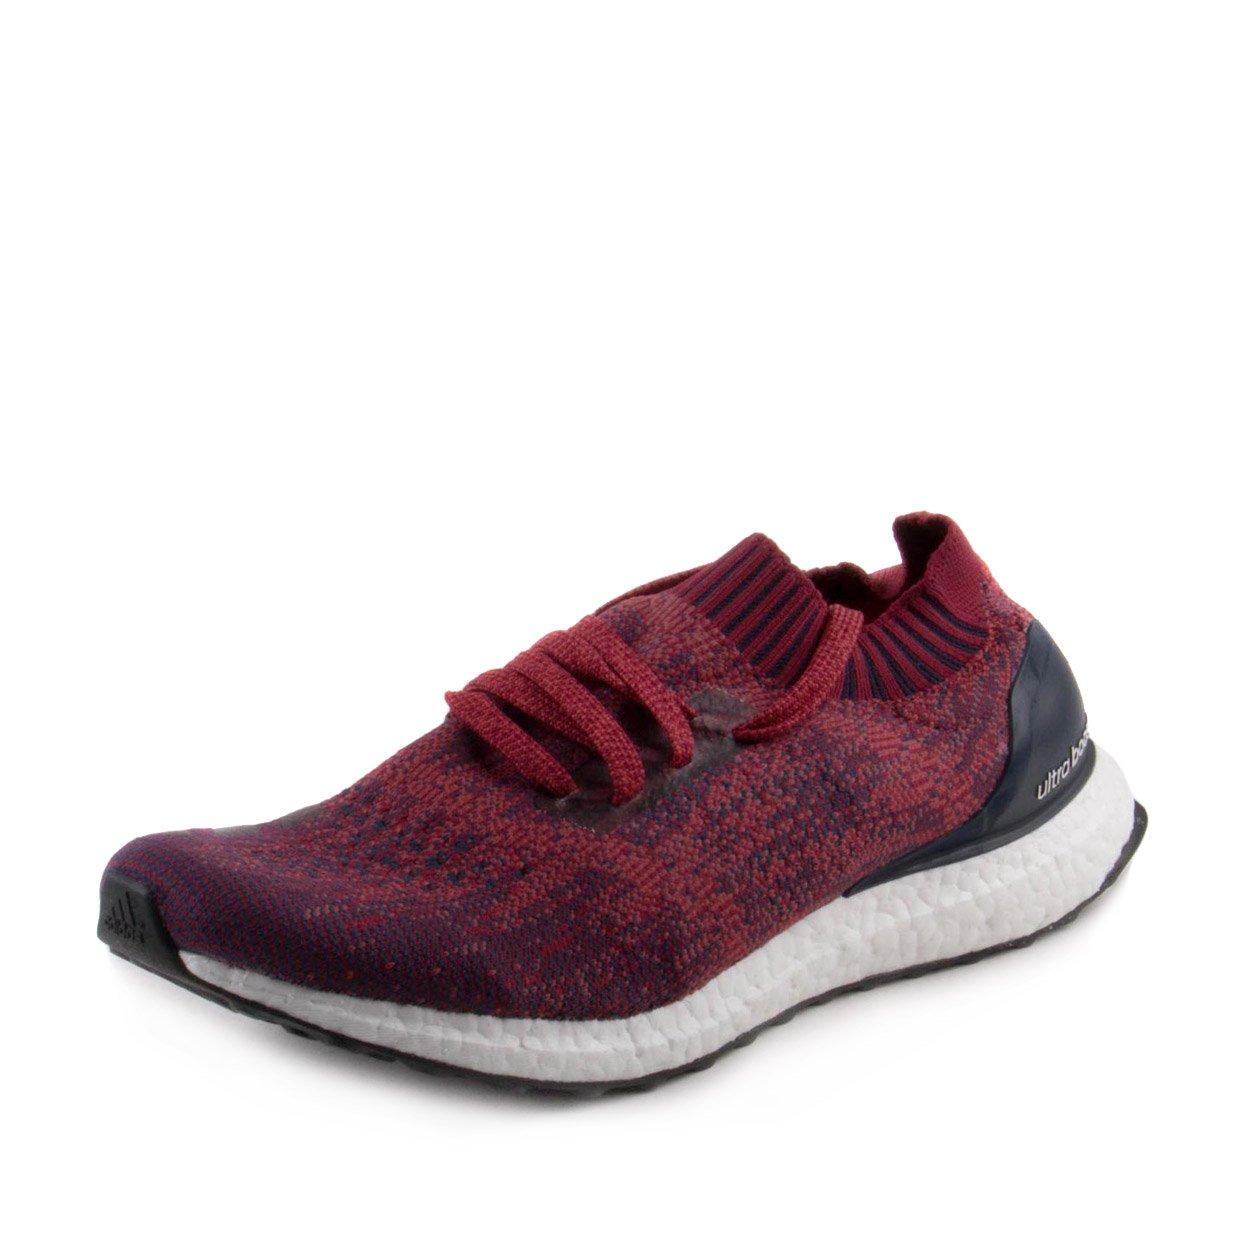 adidas Ultraboost Uncaged Shoe Men's Running 9 Mystery RedBurgundyNavy